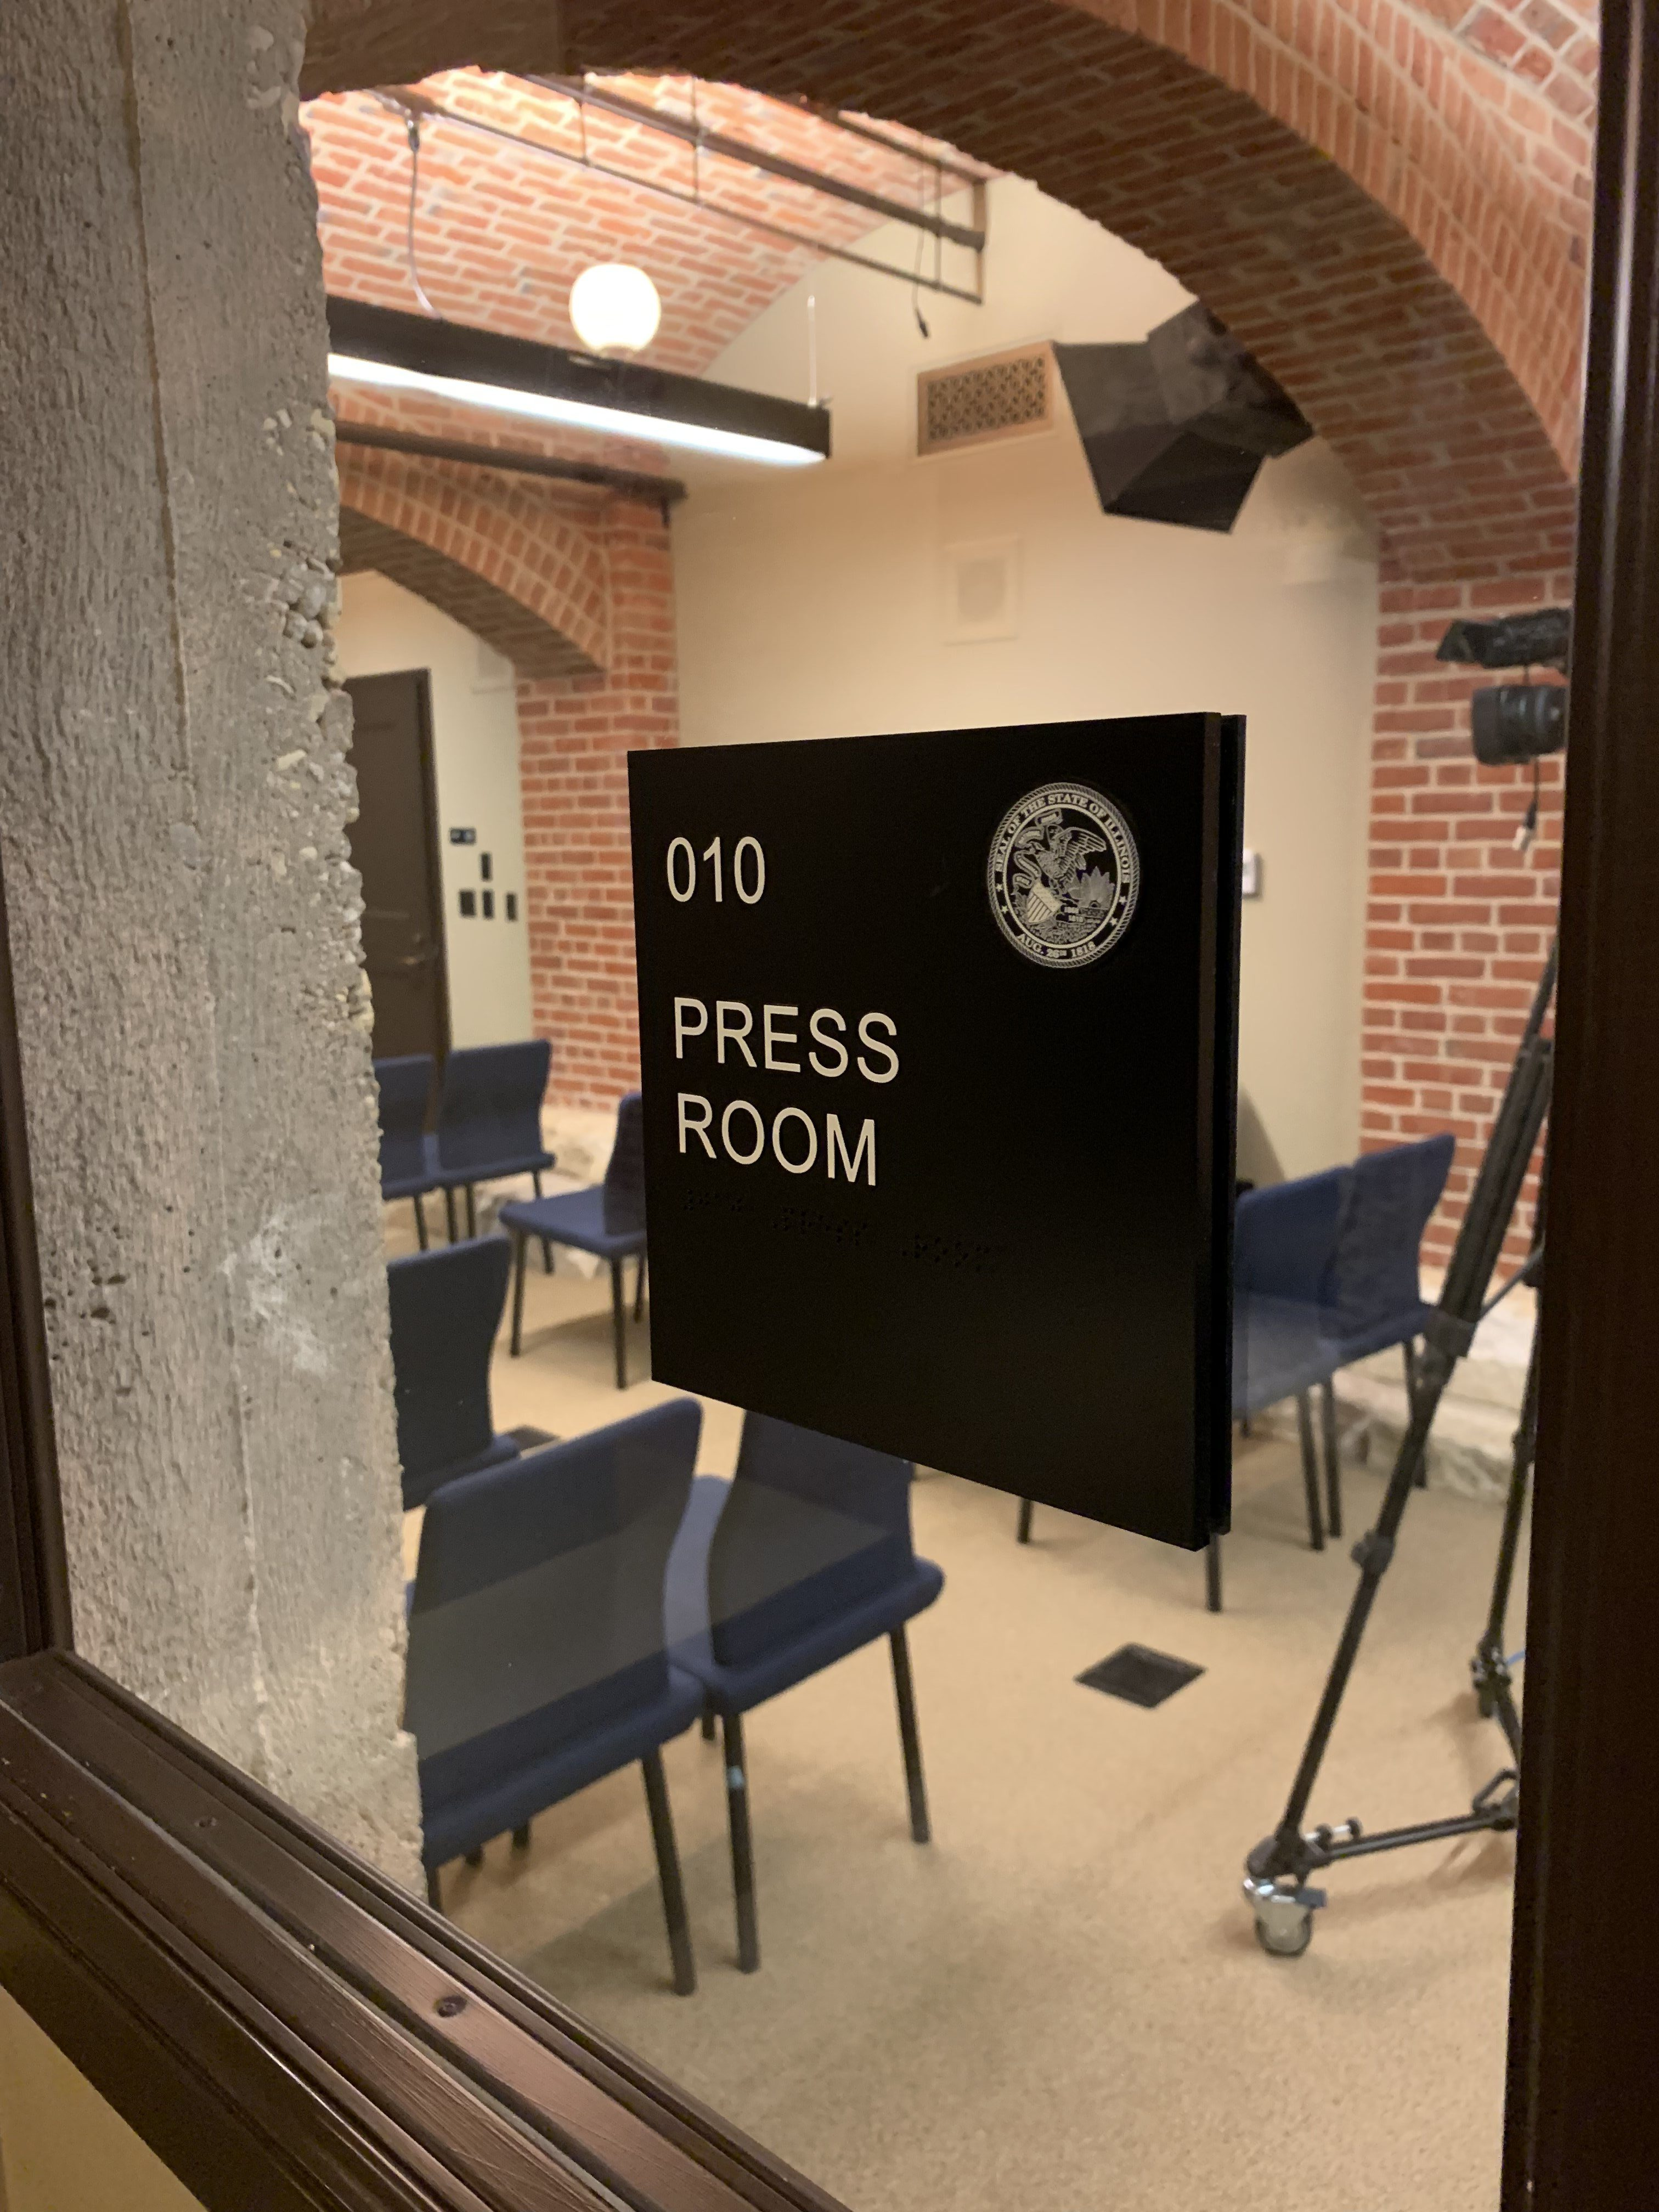 010 Press Room